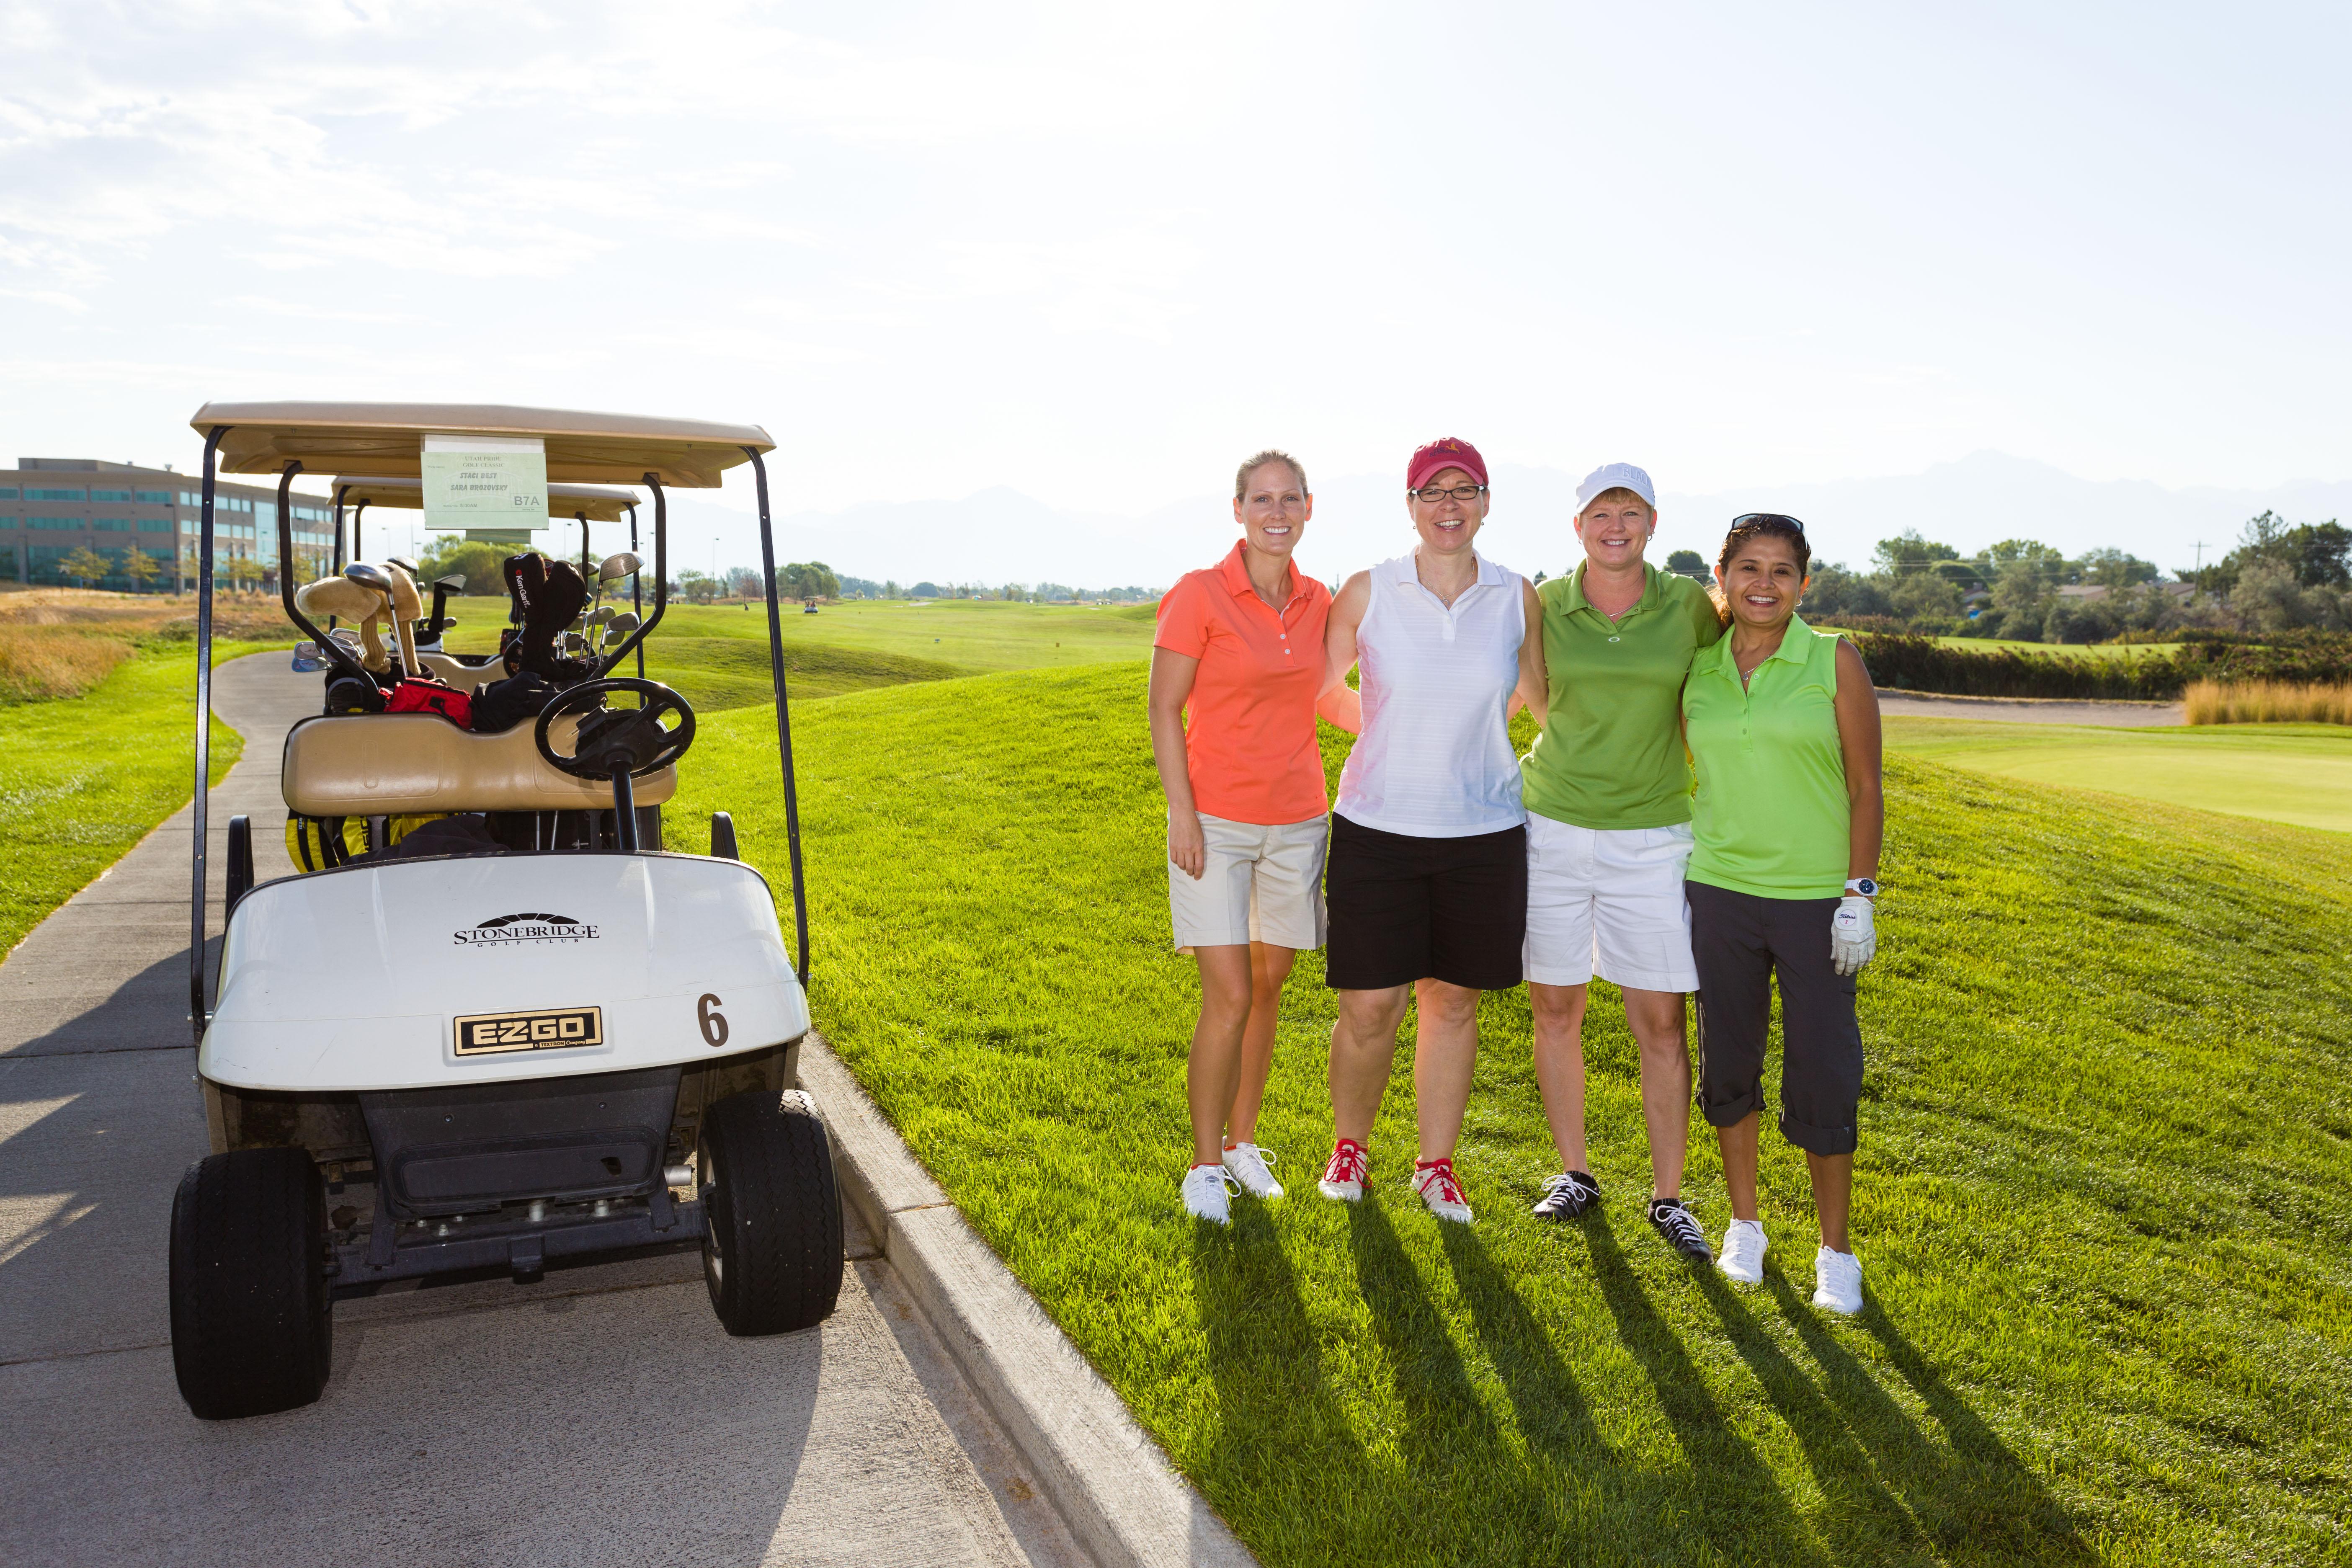 A golf team poses for their team portrait